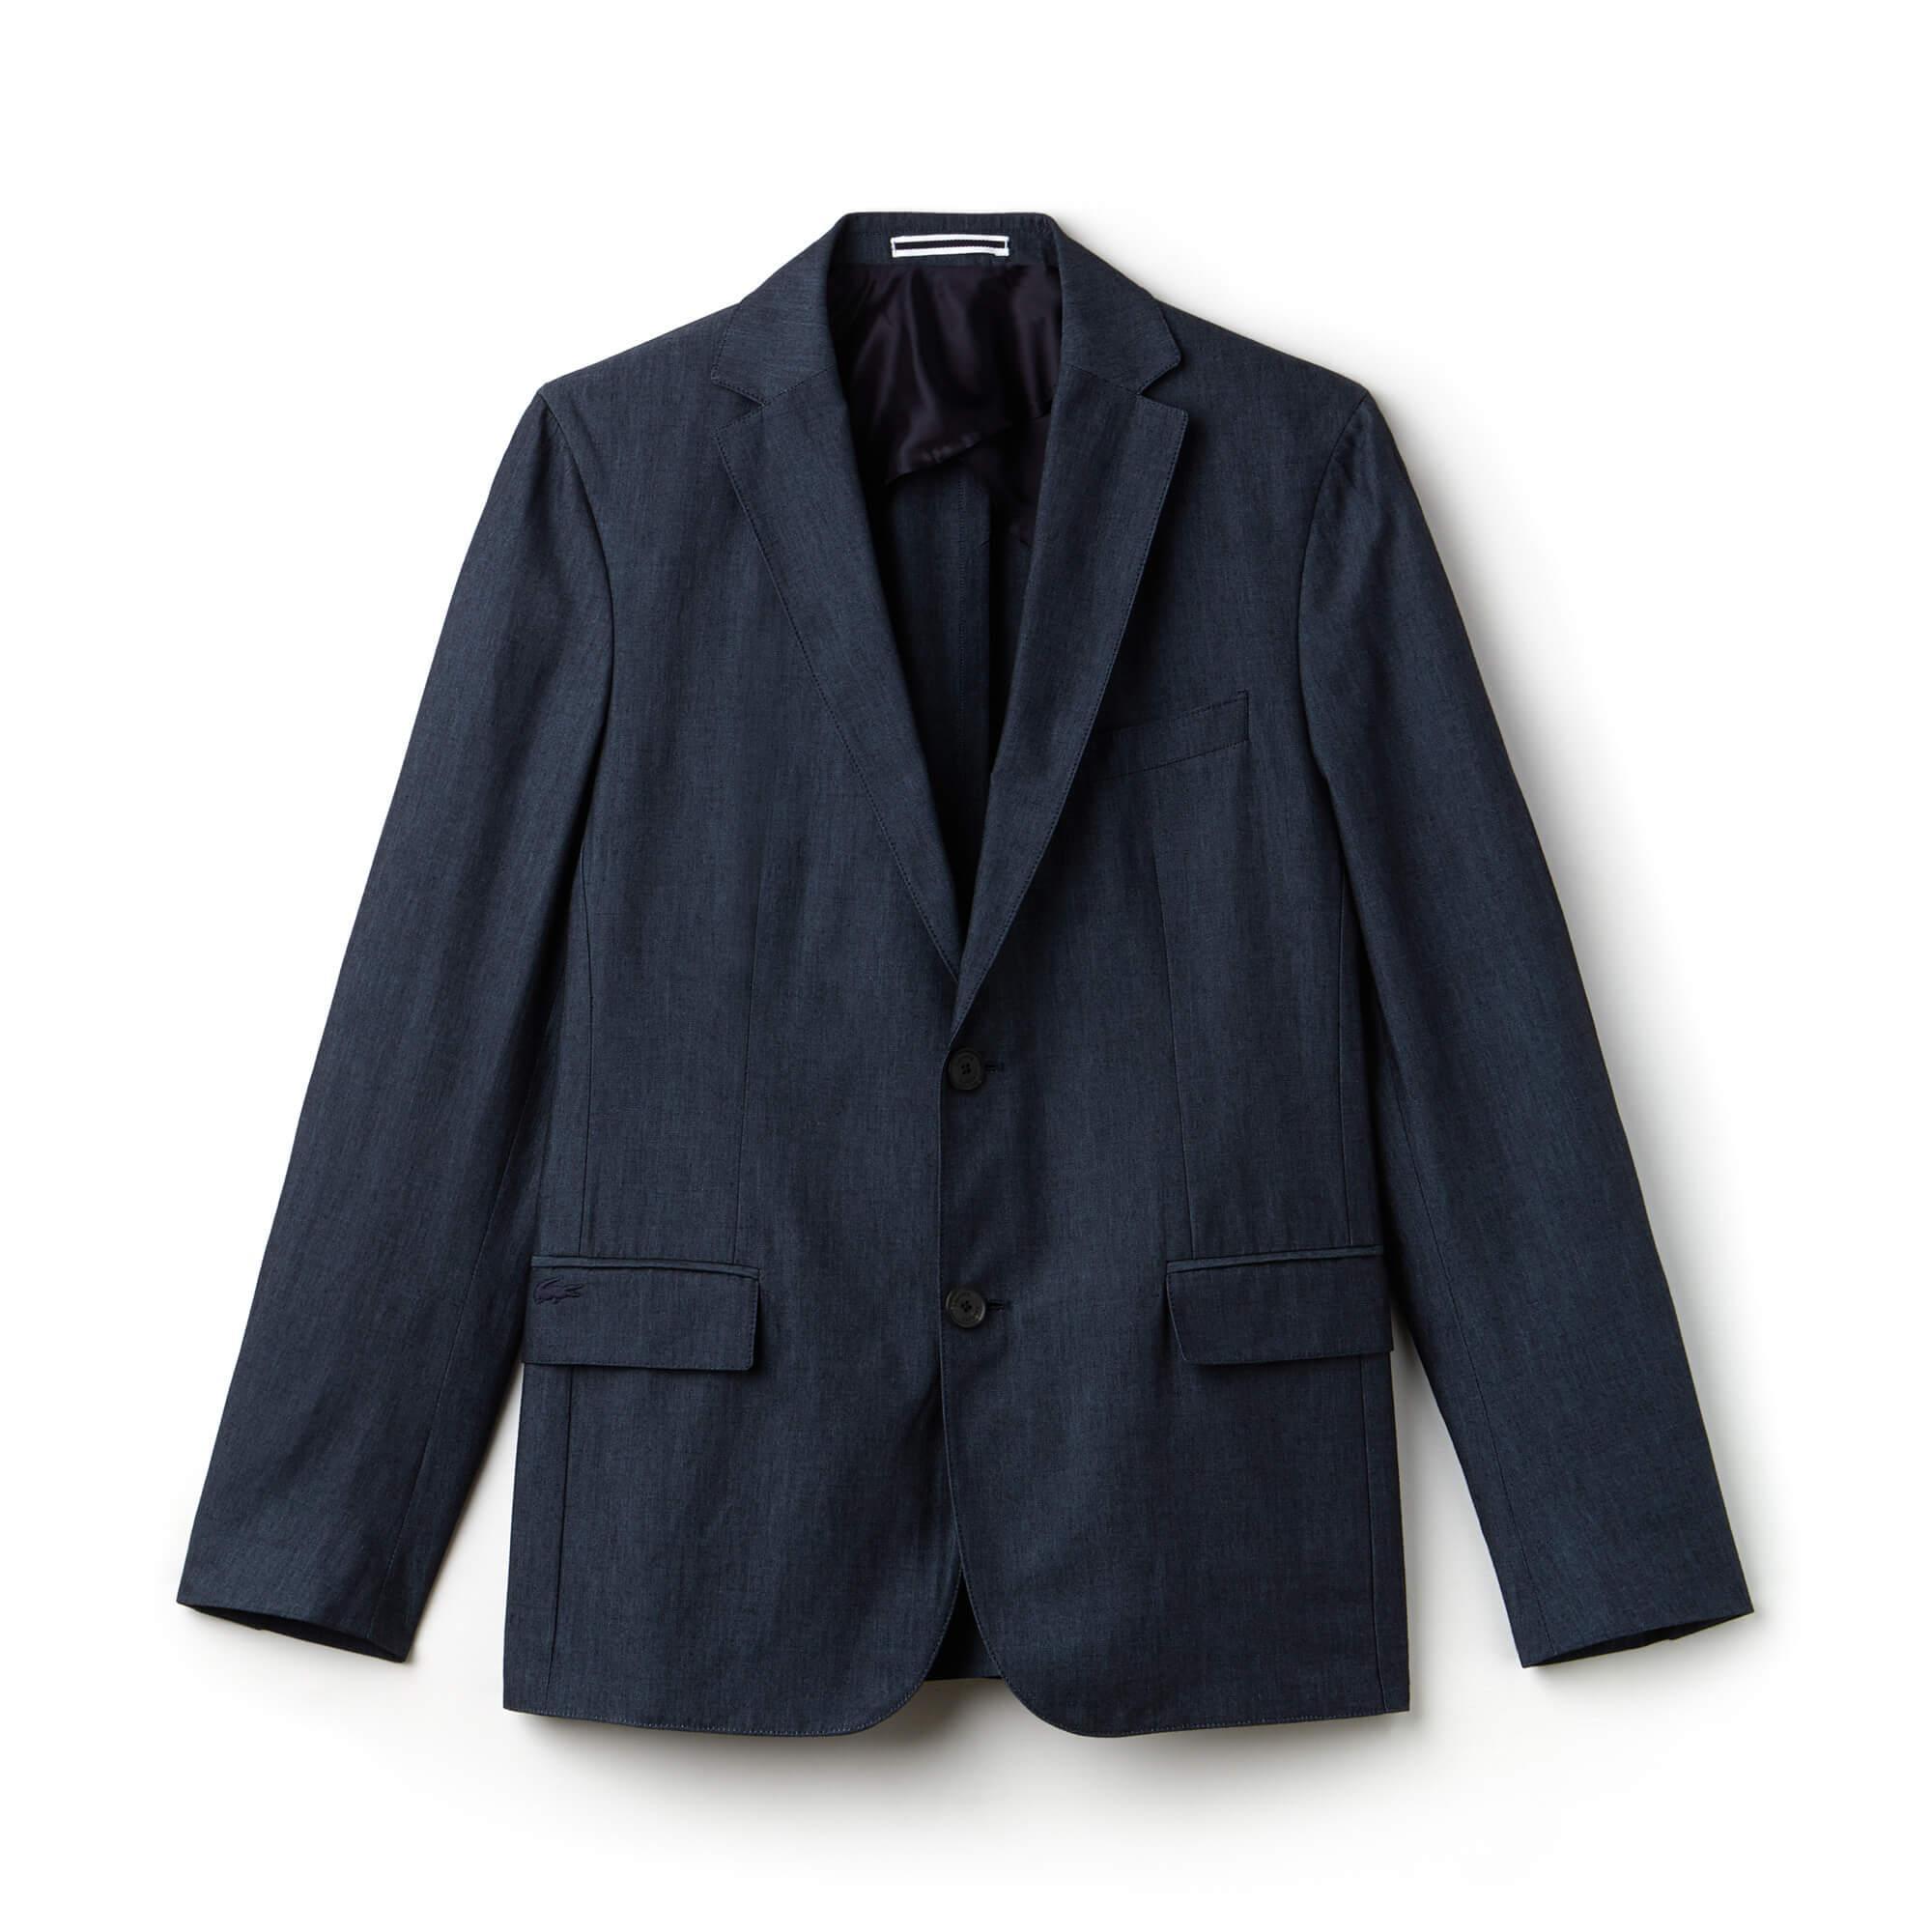 Lacoste Erkek Slim Fit  Lacivert Ceket